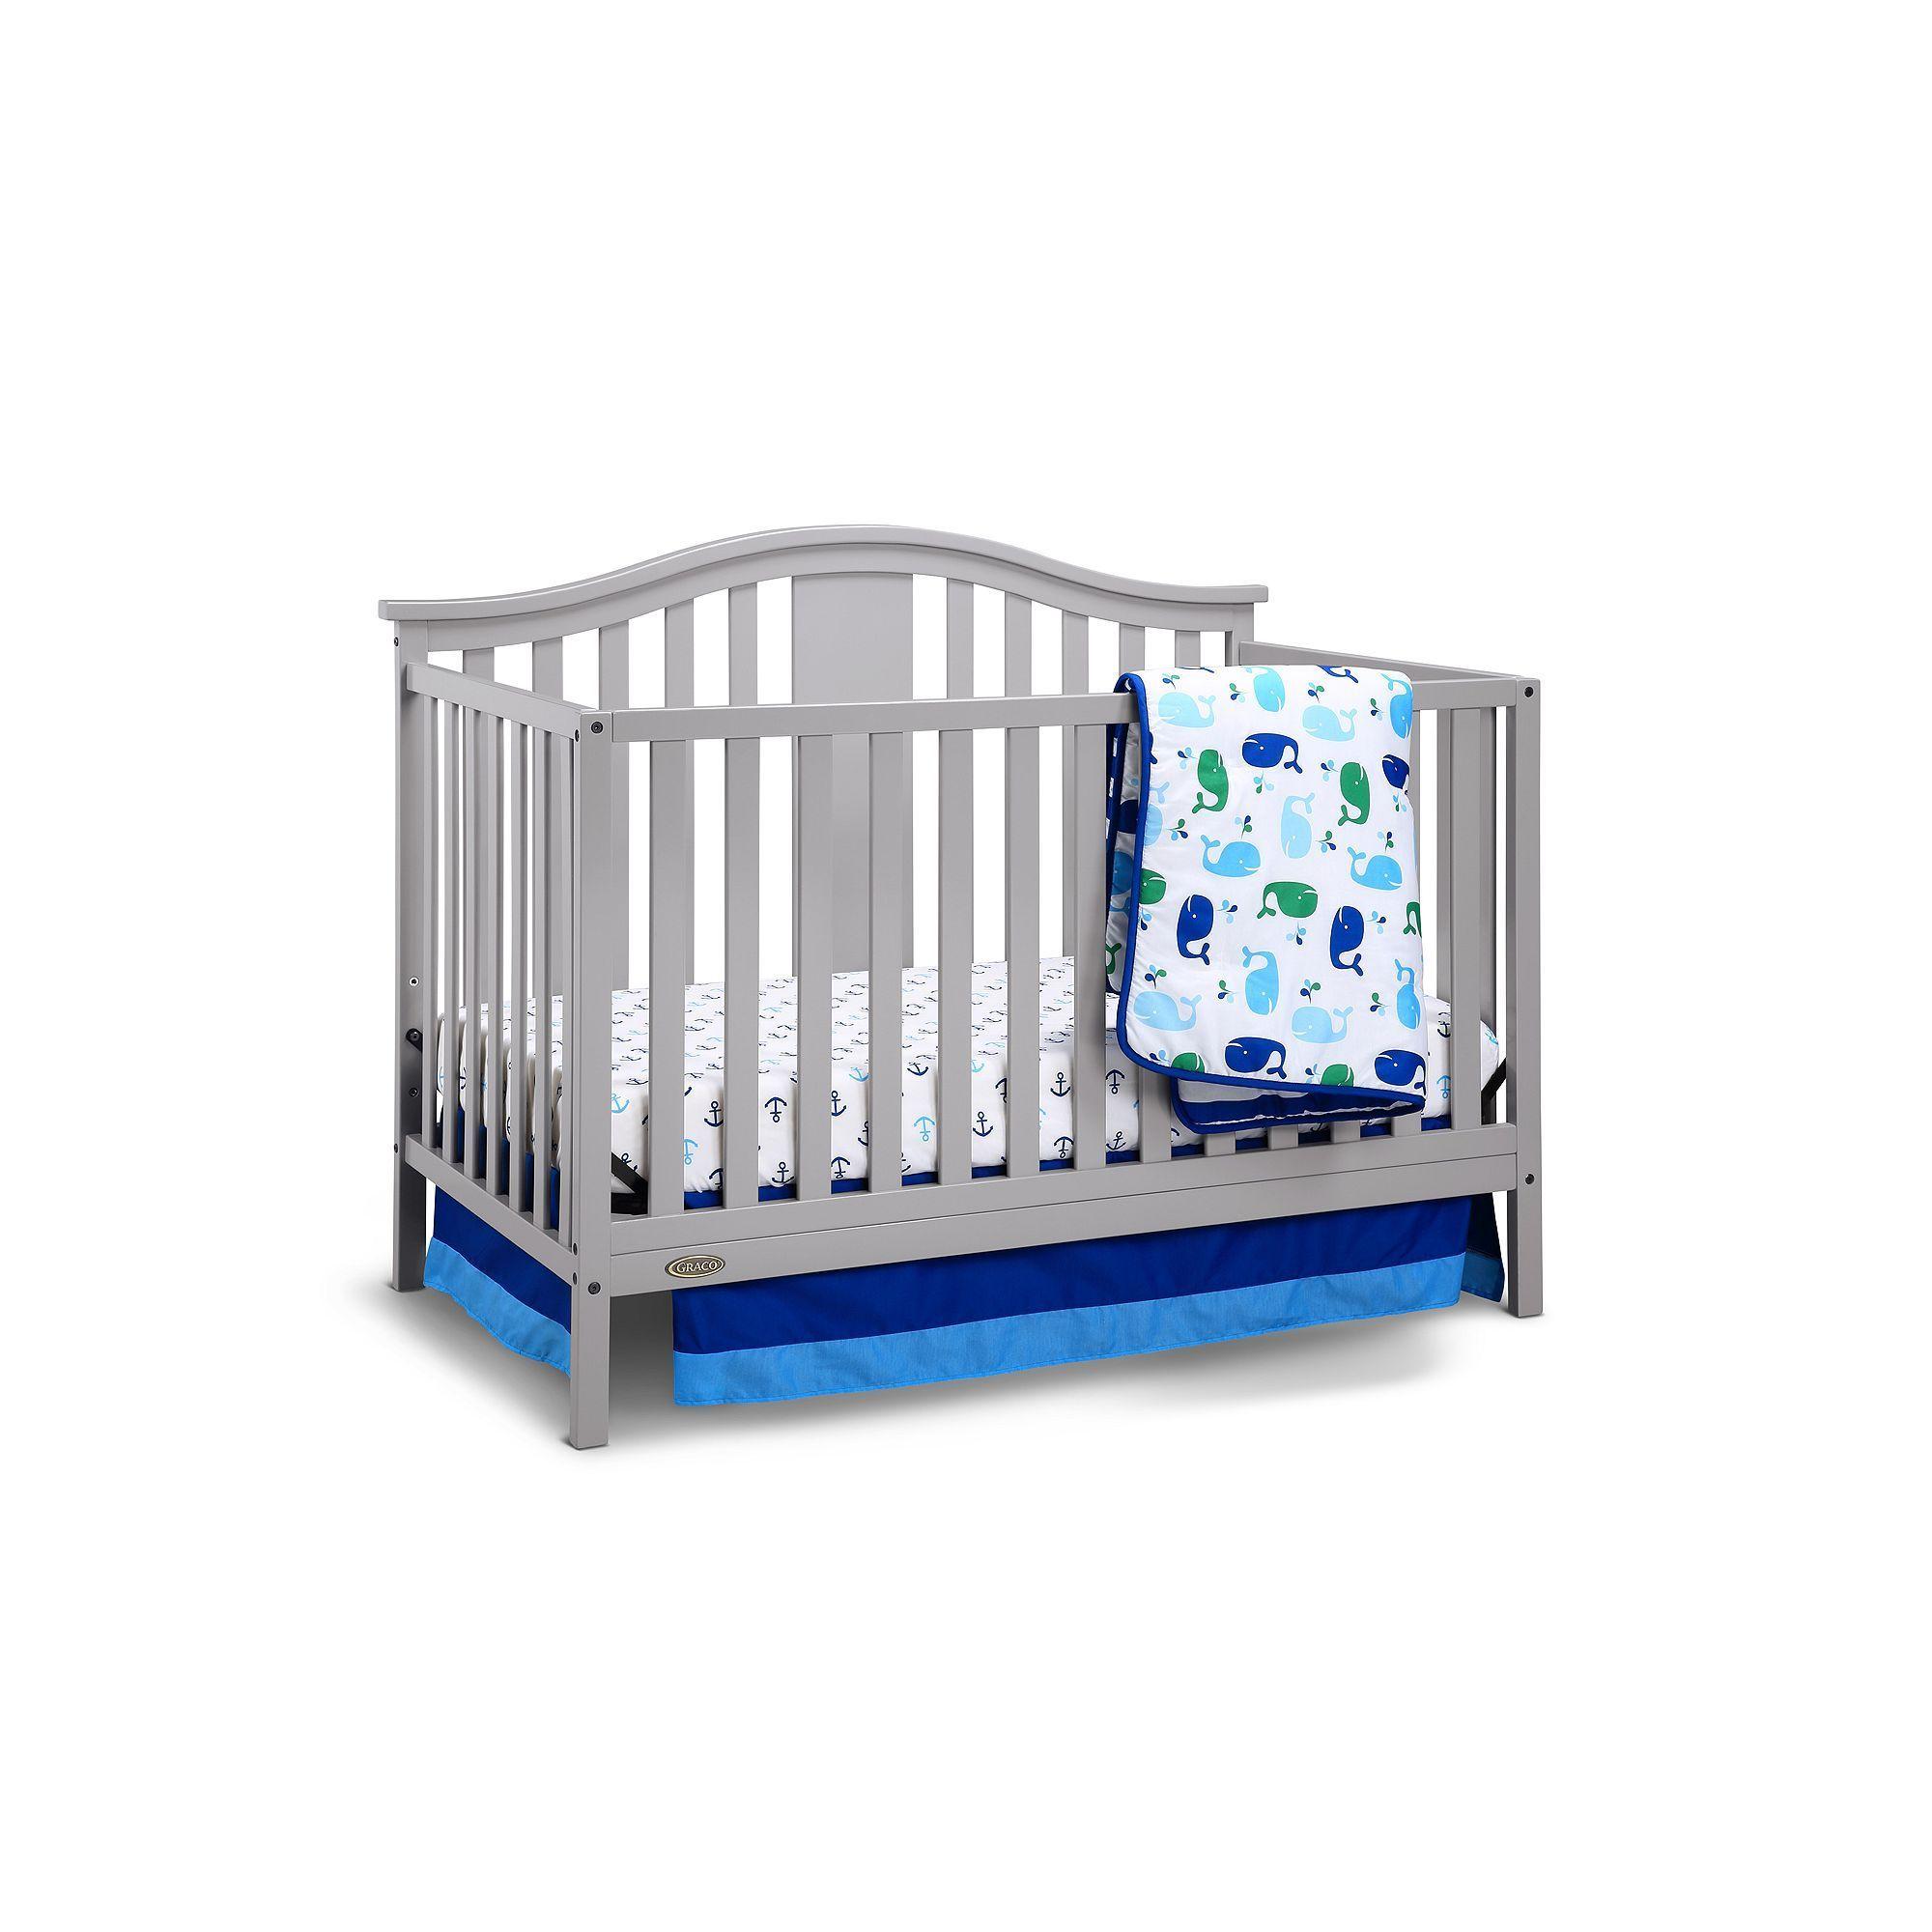 Graco Solano 4 in 1 Convertible Crib with Mattress White